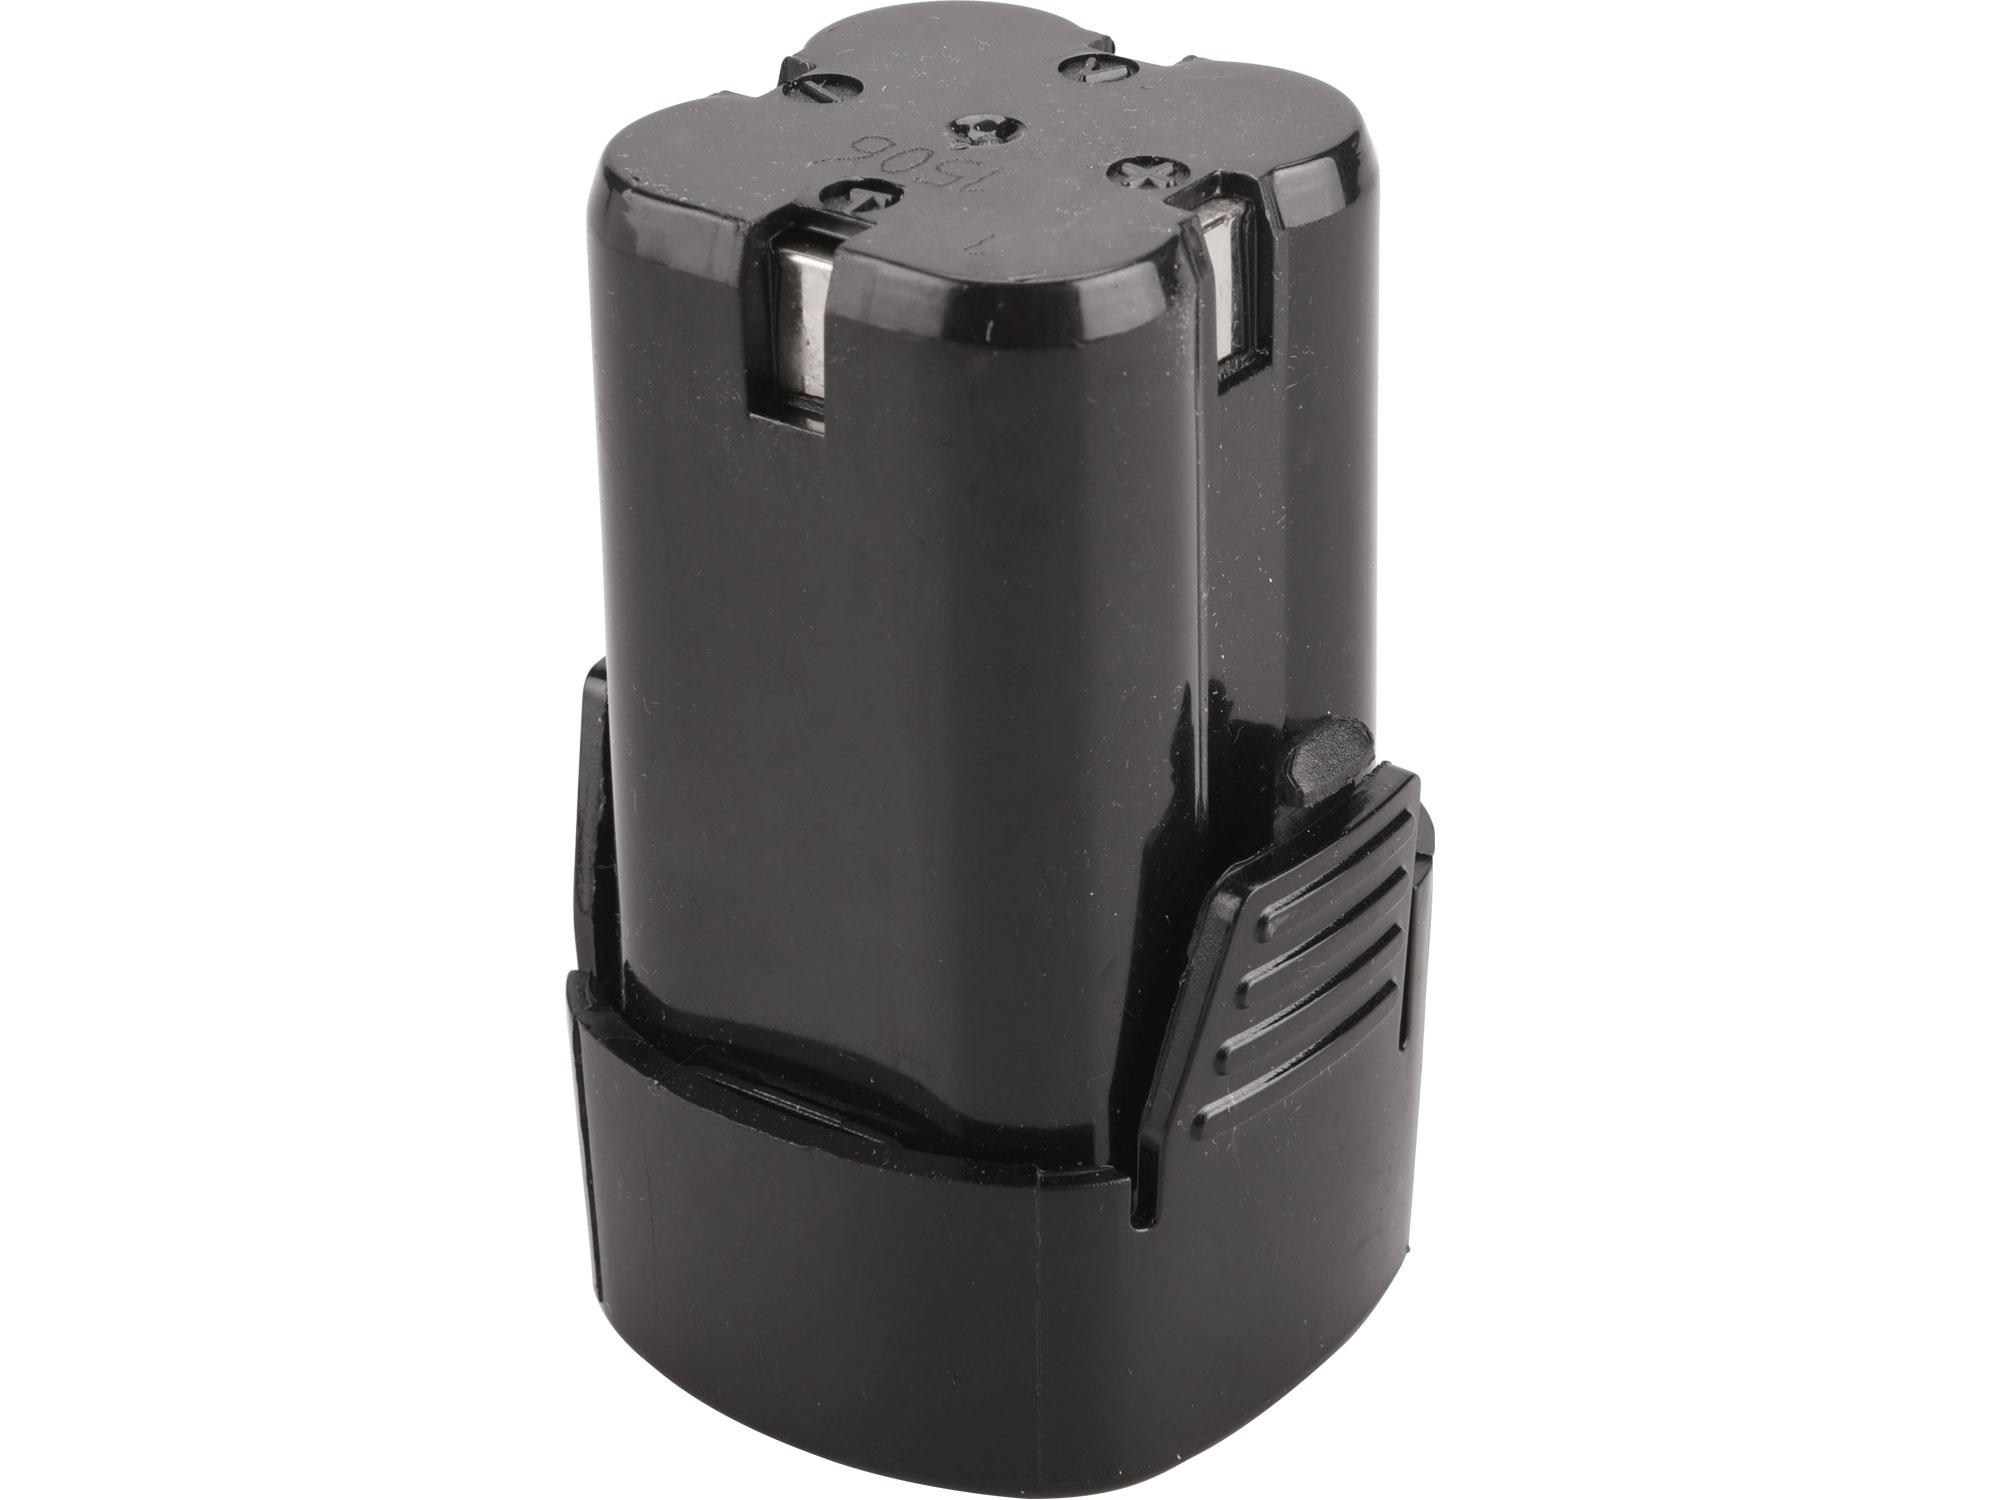 Baterie akumulátorová 14,4V, Li-ion, 1300mAh EXTOL 8791151B